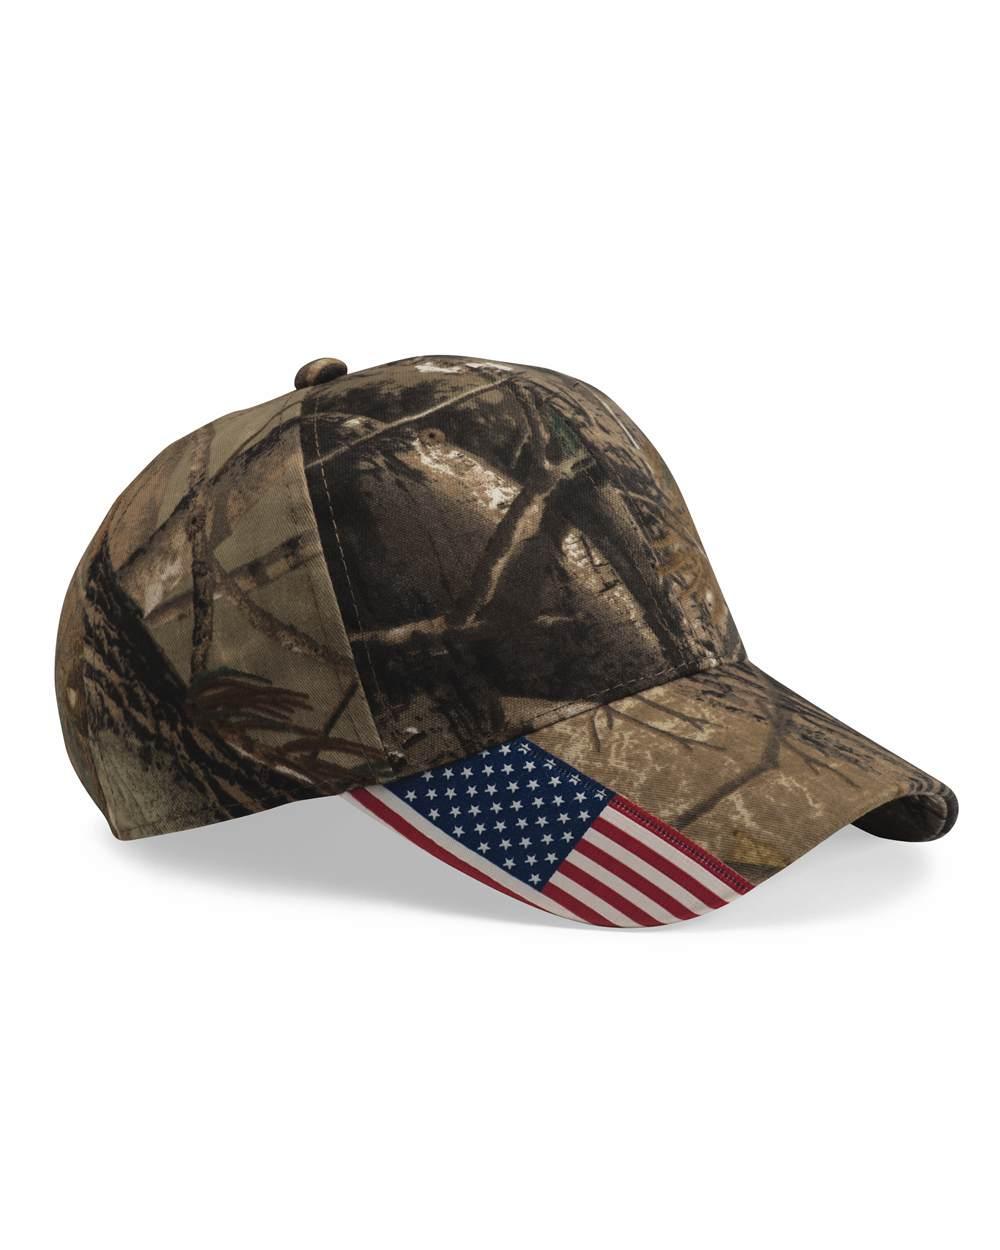 Outdoor Cap CWF305 带美国国旗帽子